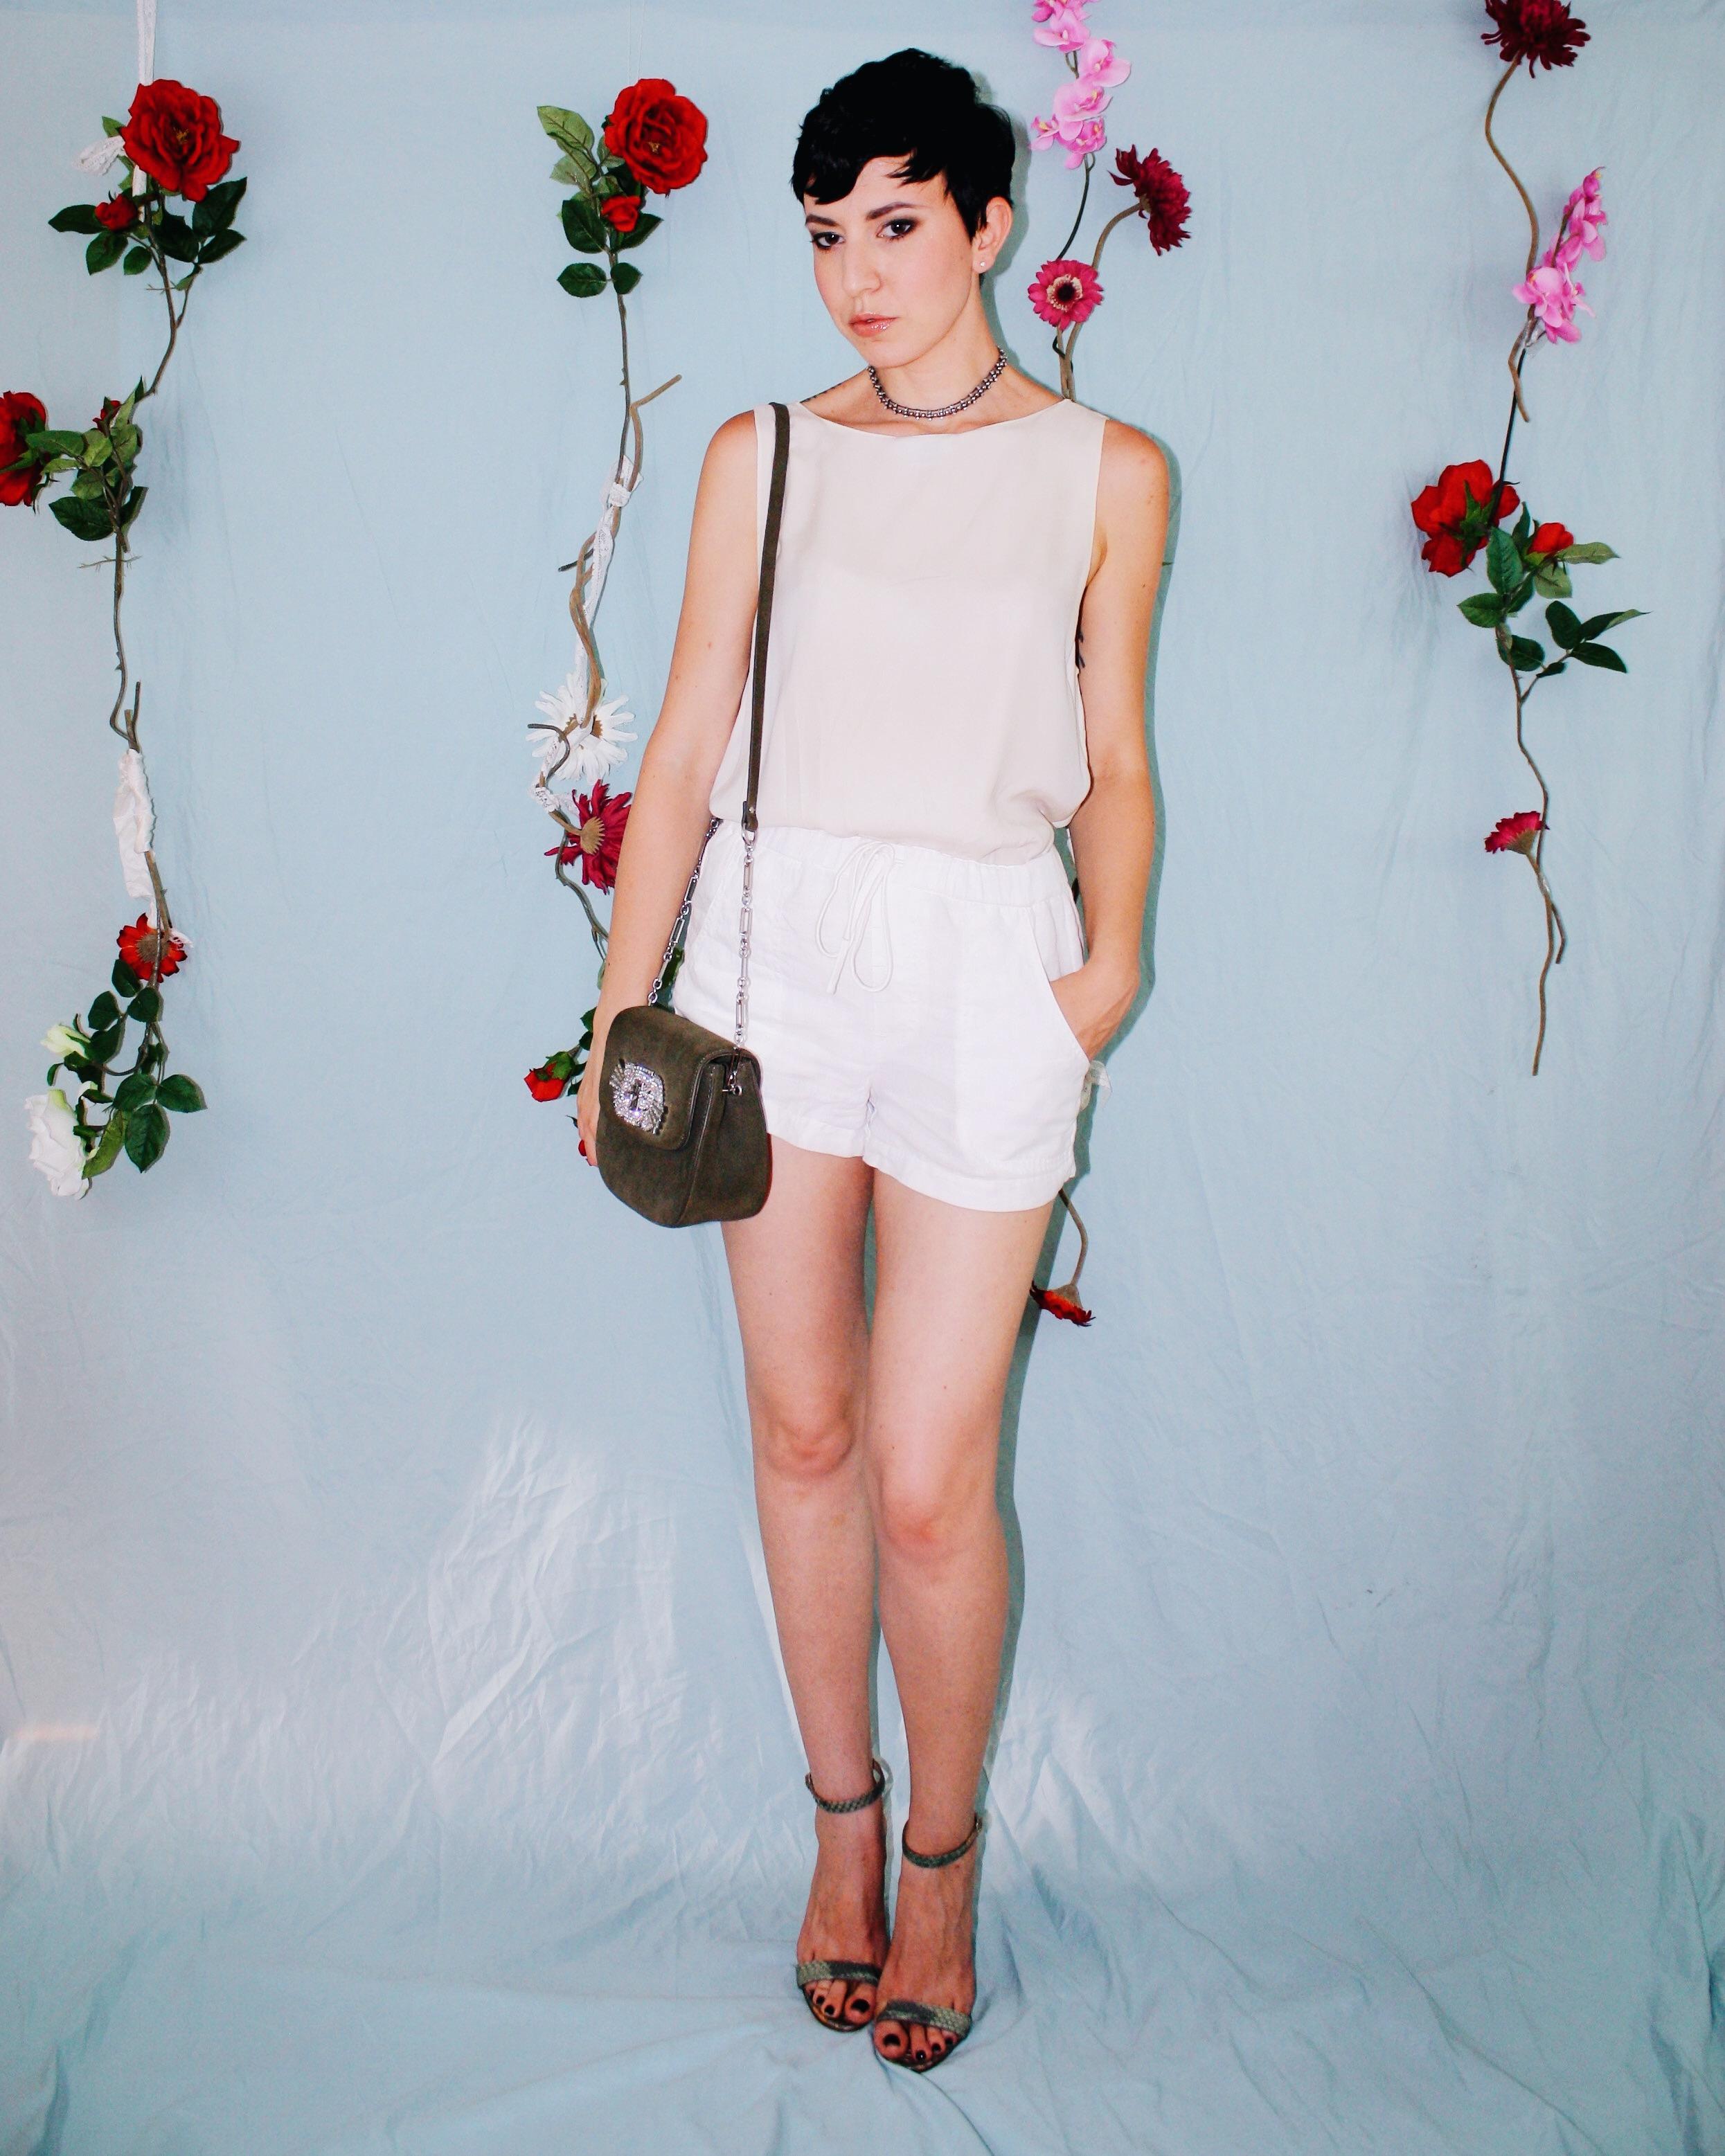 labor day outfit ideas white leggings silk tank lace boustier linen shorts dress 7